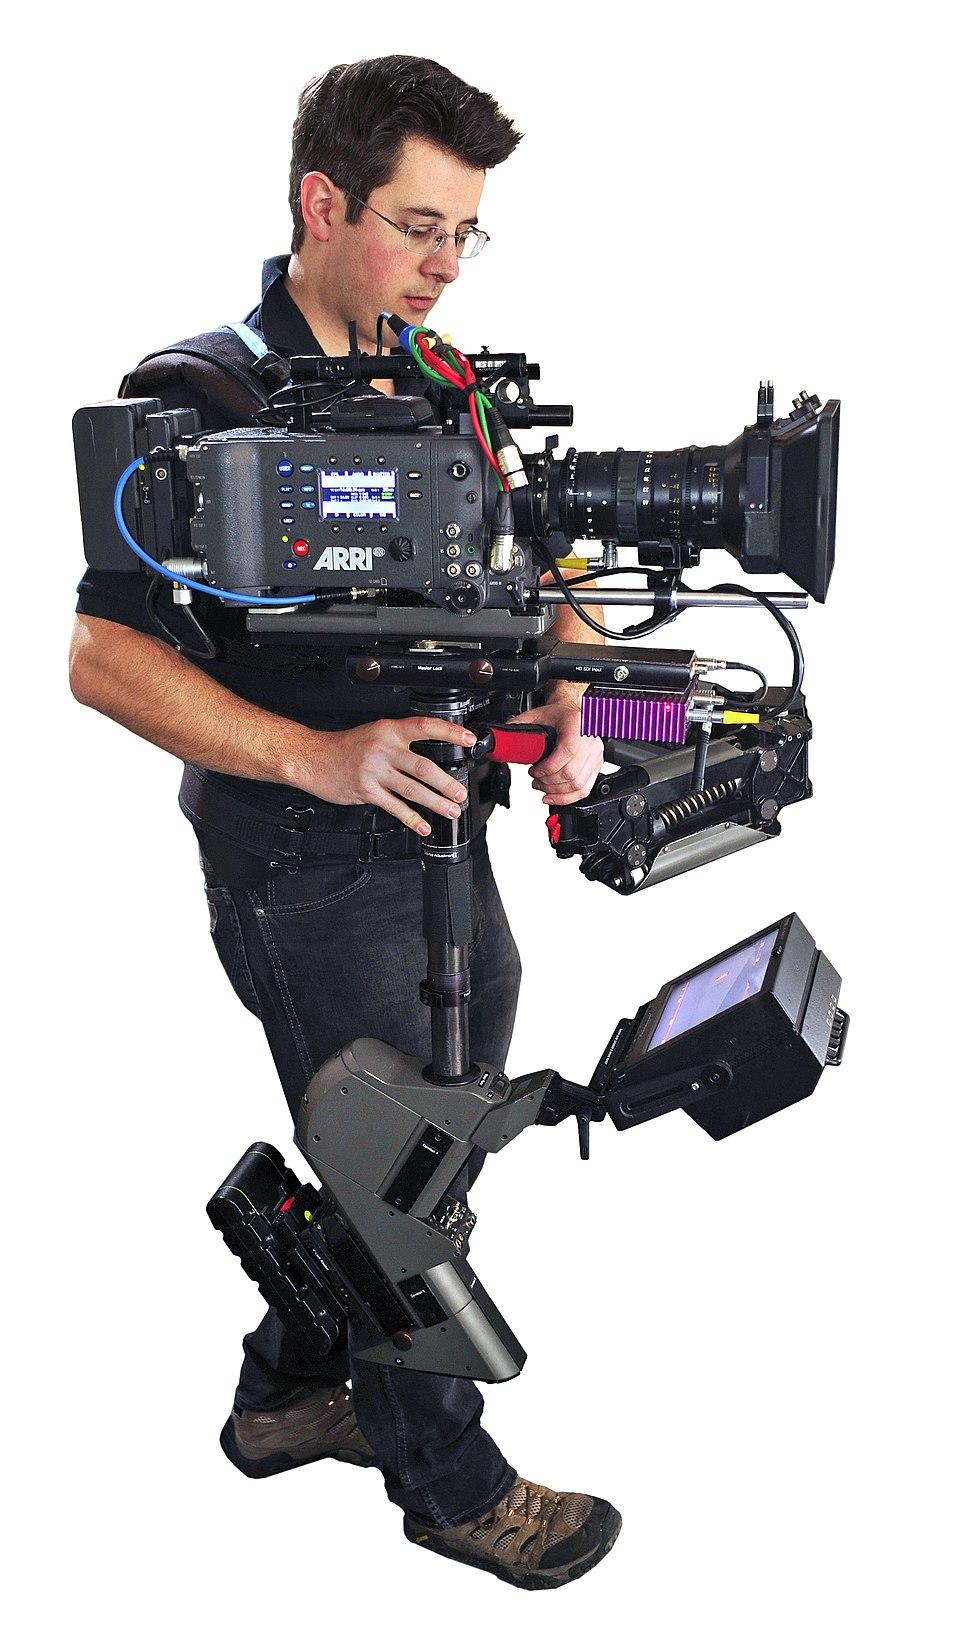 Steadicam Operator John Fry with Master Steadicam %26 Arri Alexa camera